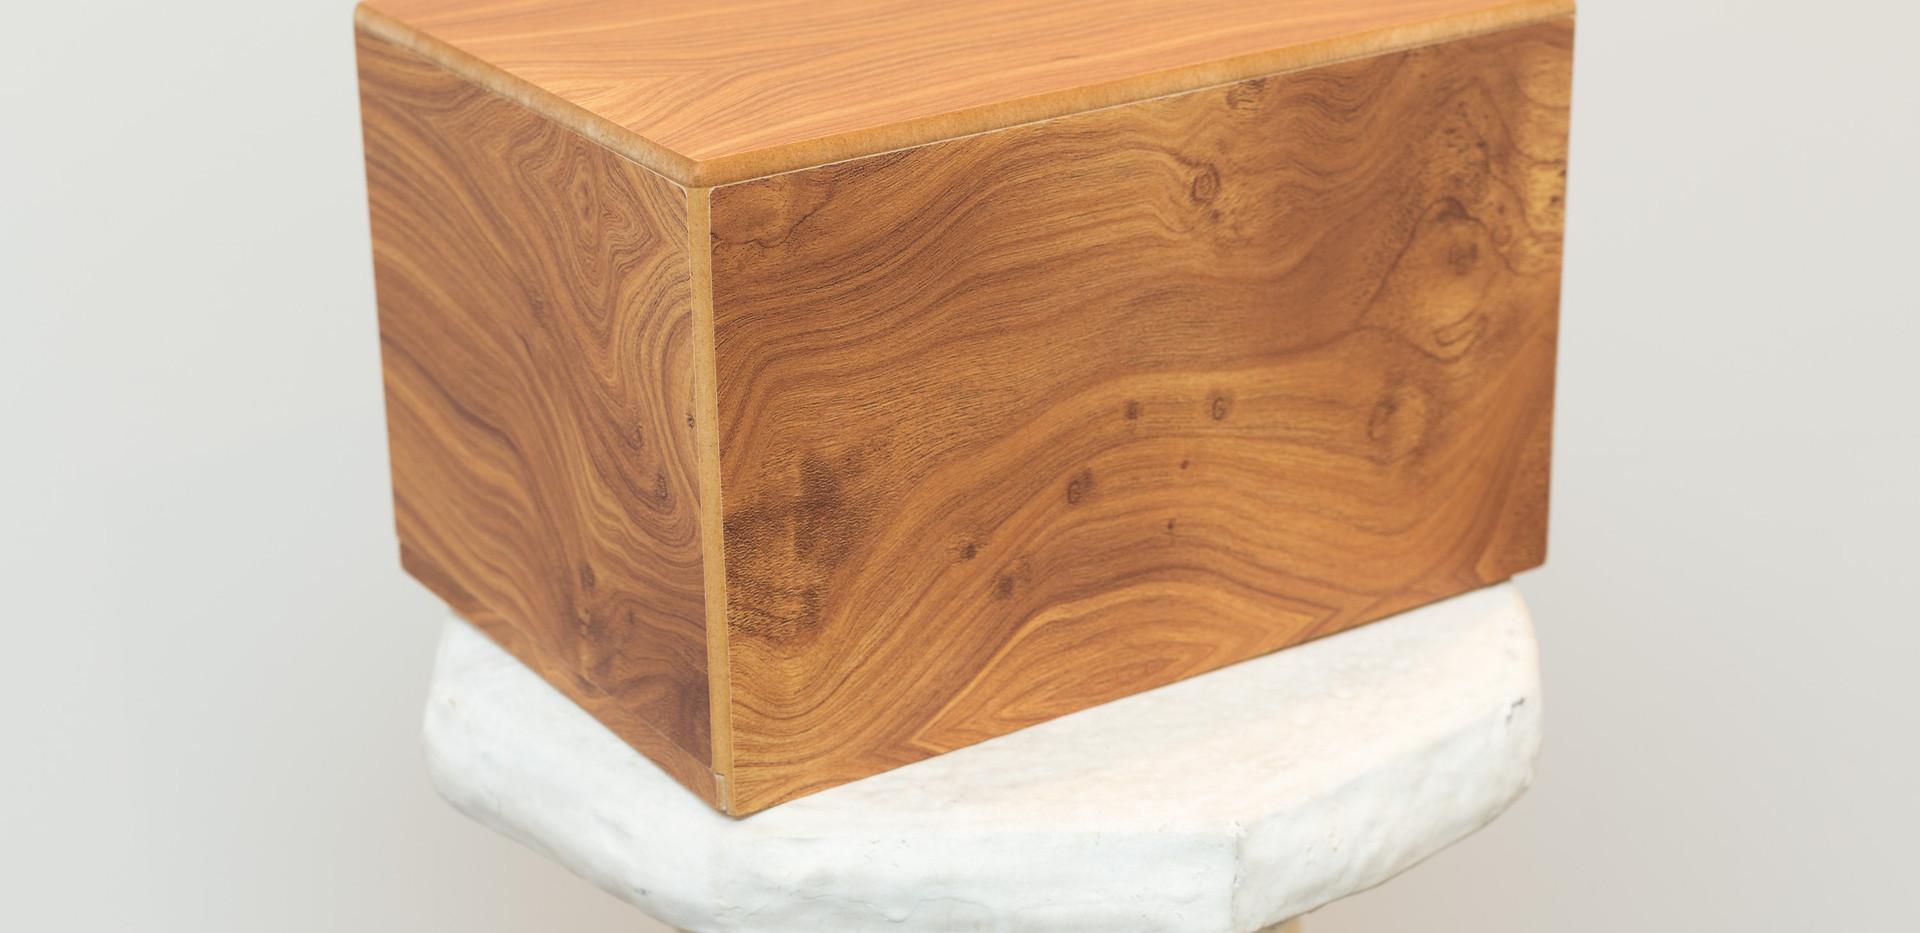 cremation urn 7 shone & shirley.jpg